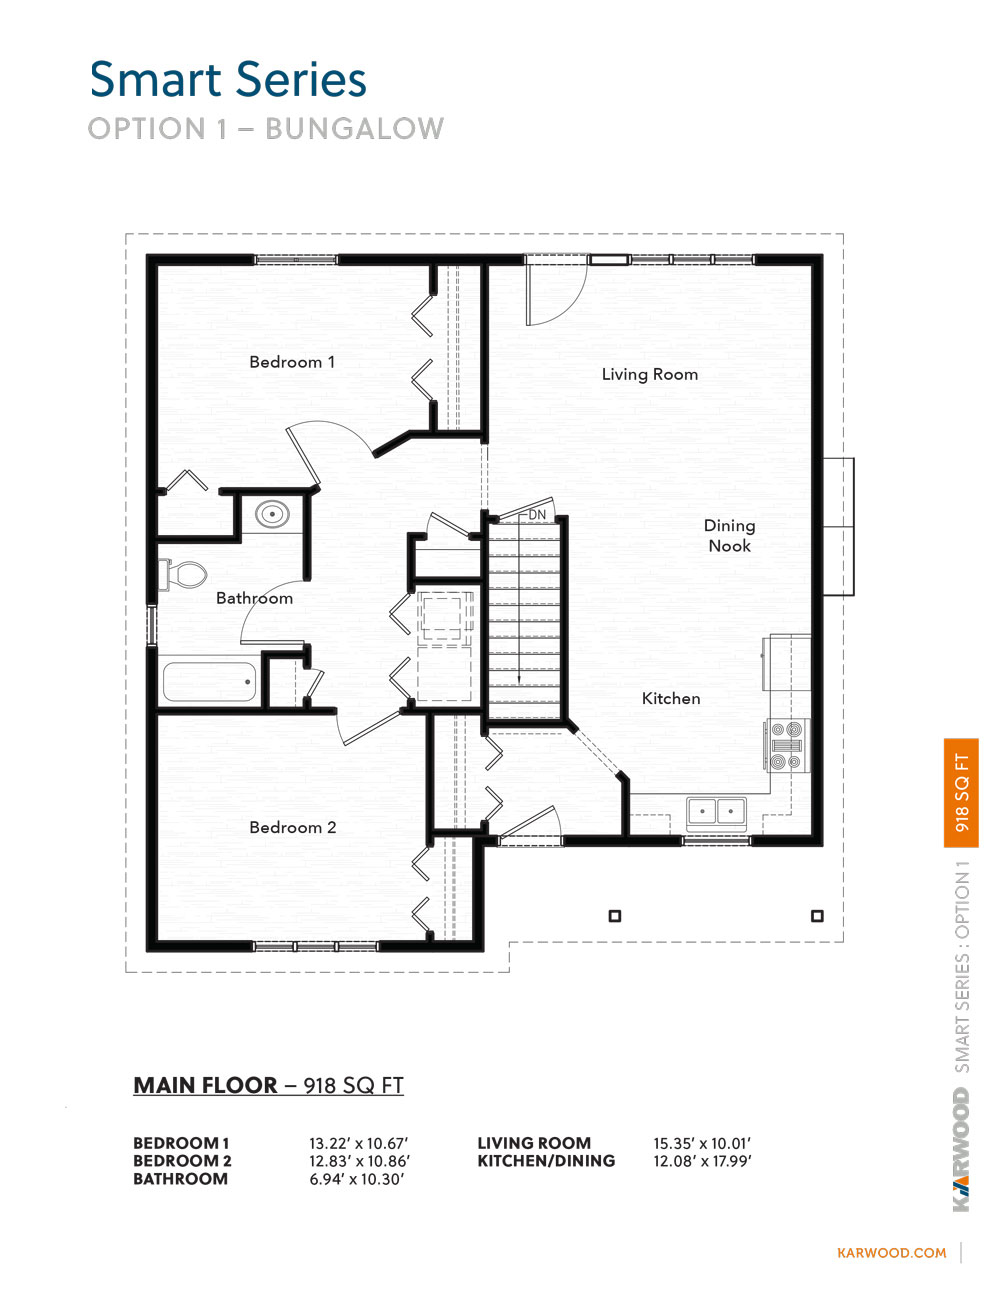 Option1-Bungalow–SmartSeries-2.jpg